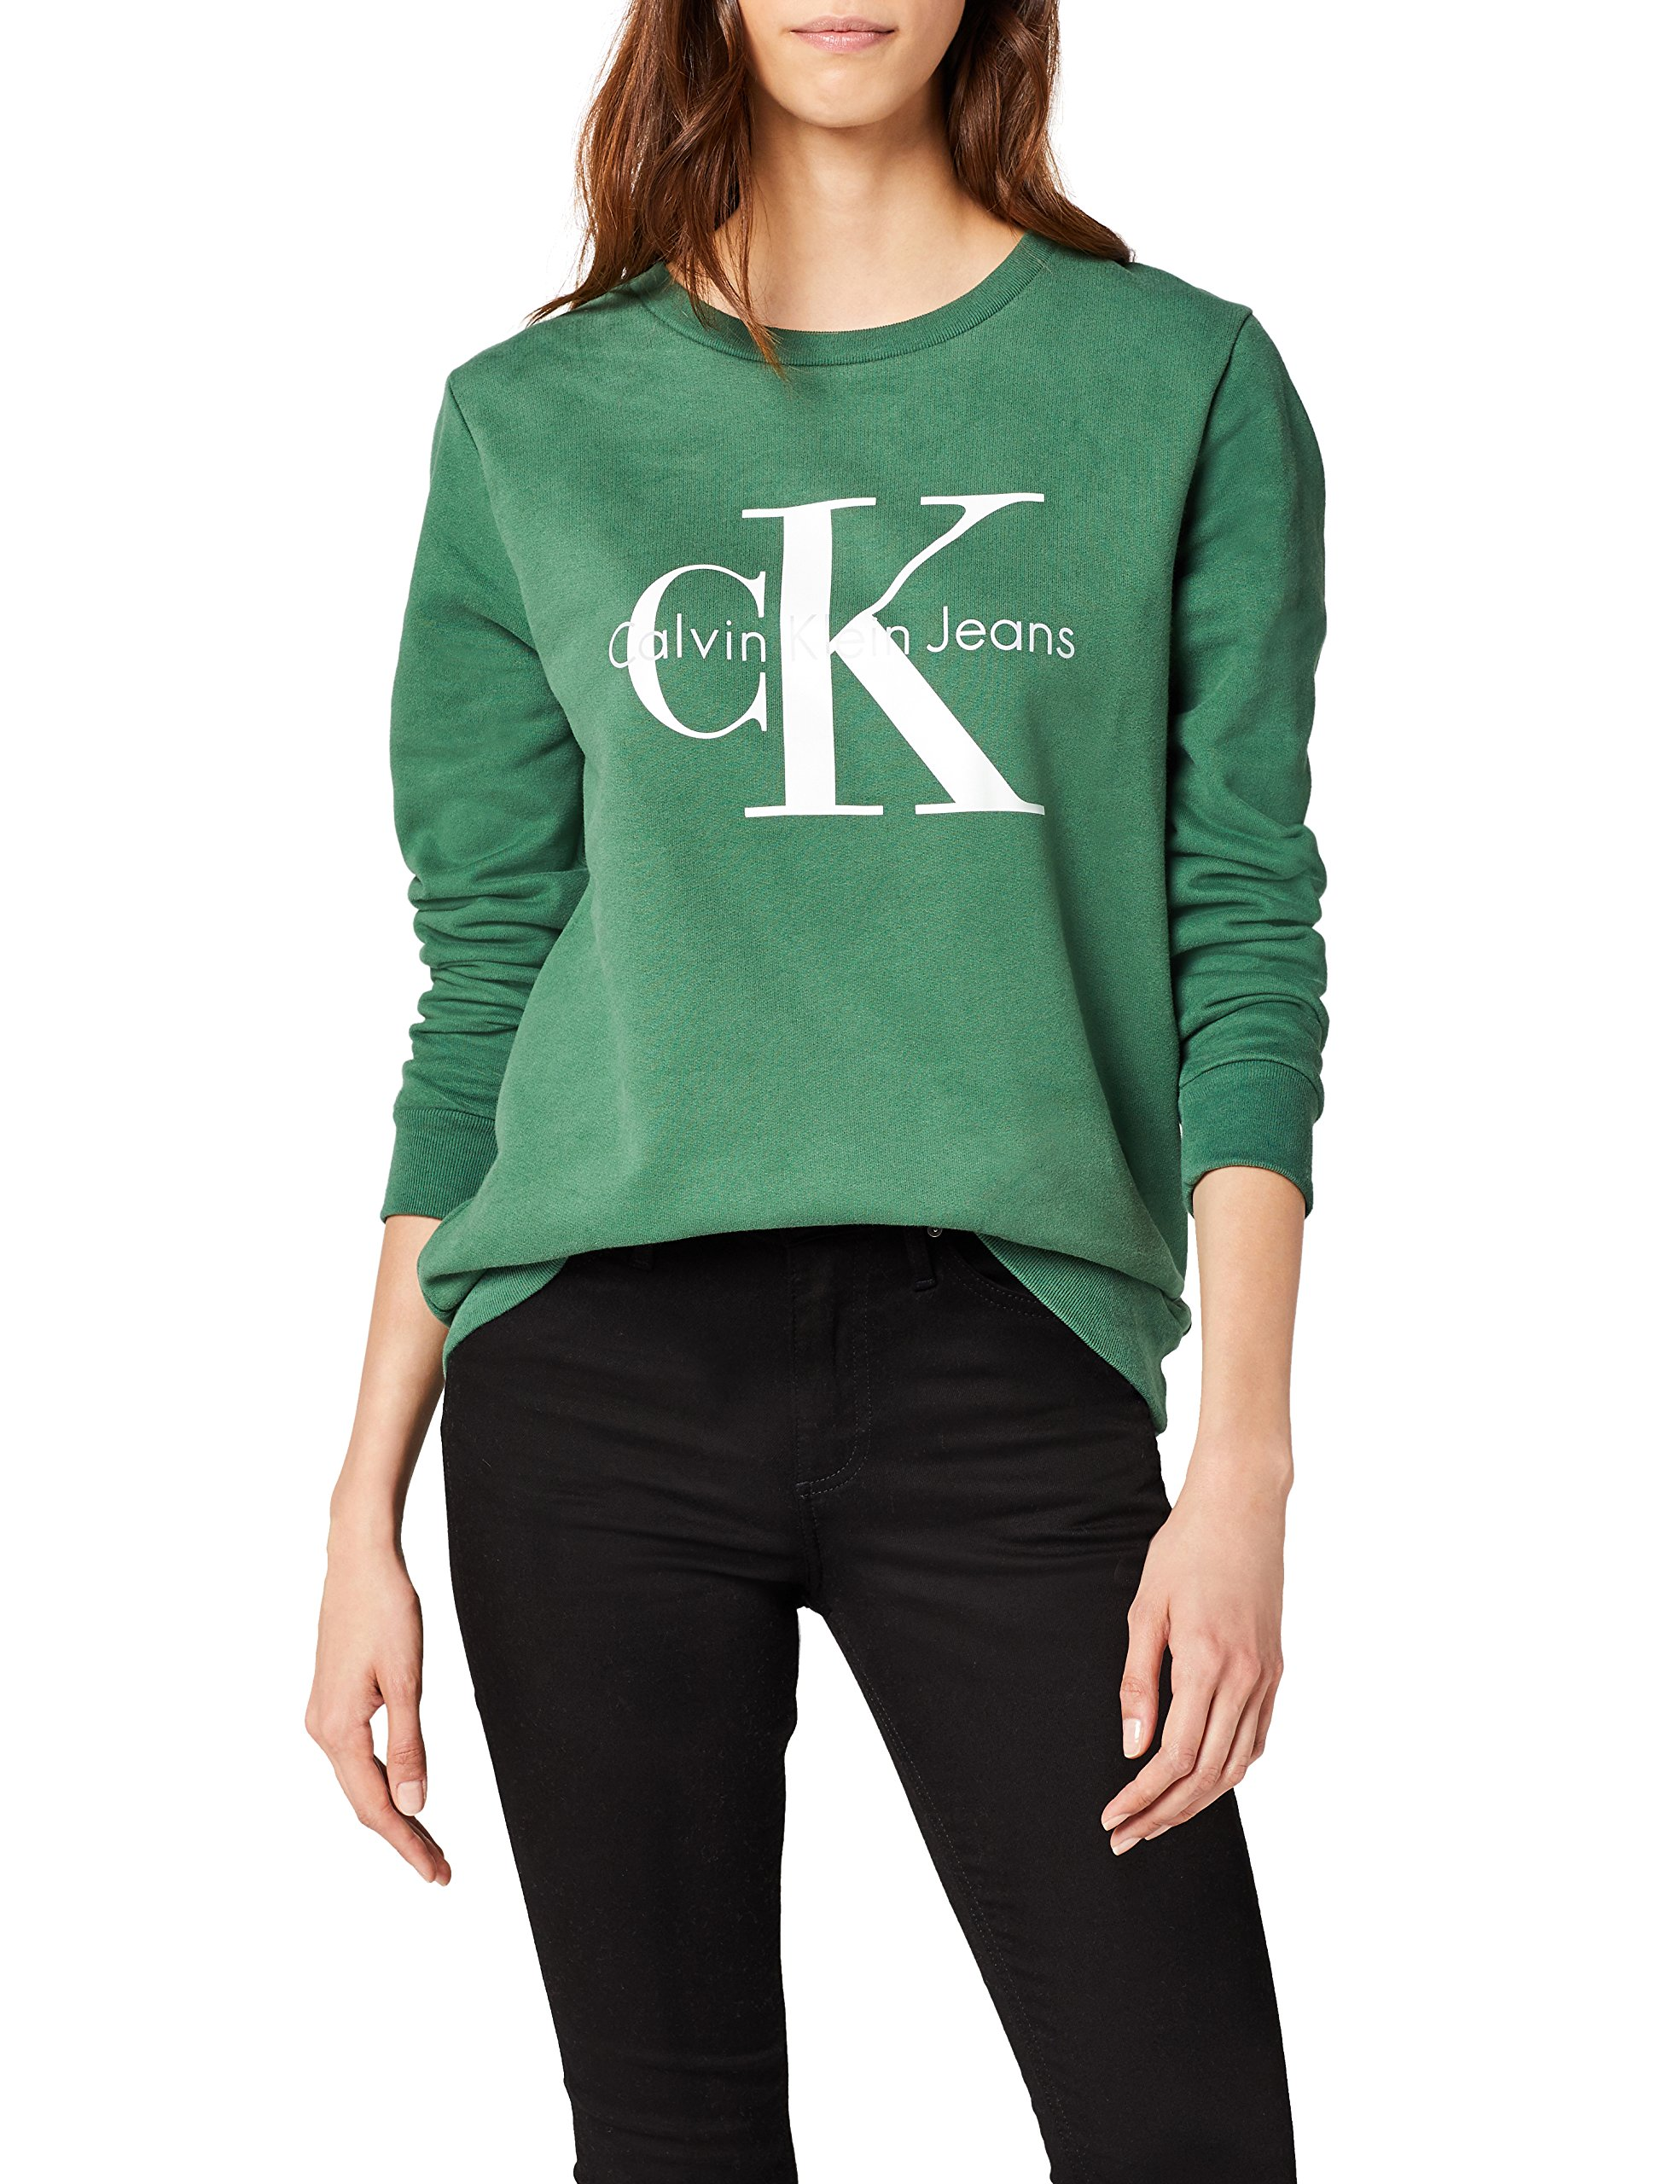 Green small Klein Sweat Neck Femme True Jeans Calvin Icon shirtVerttrekking Crew Hwk 347X N0nPk8wOX